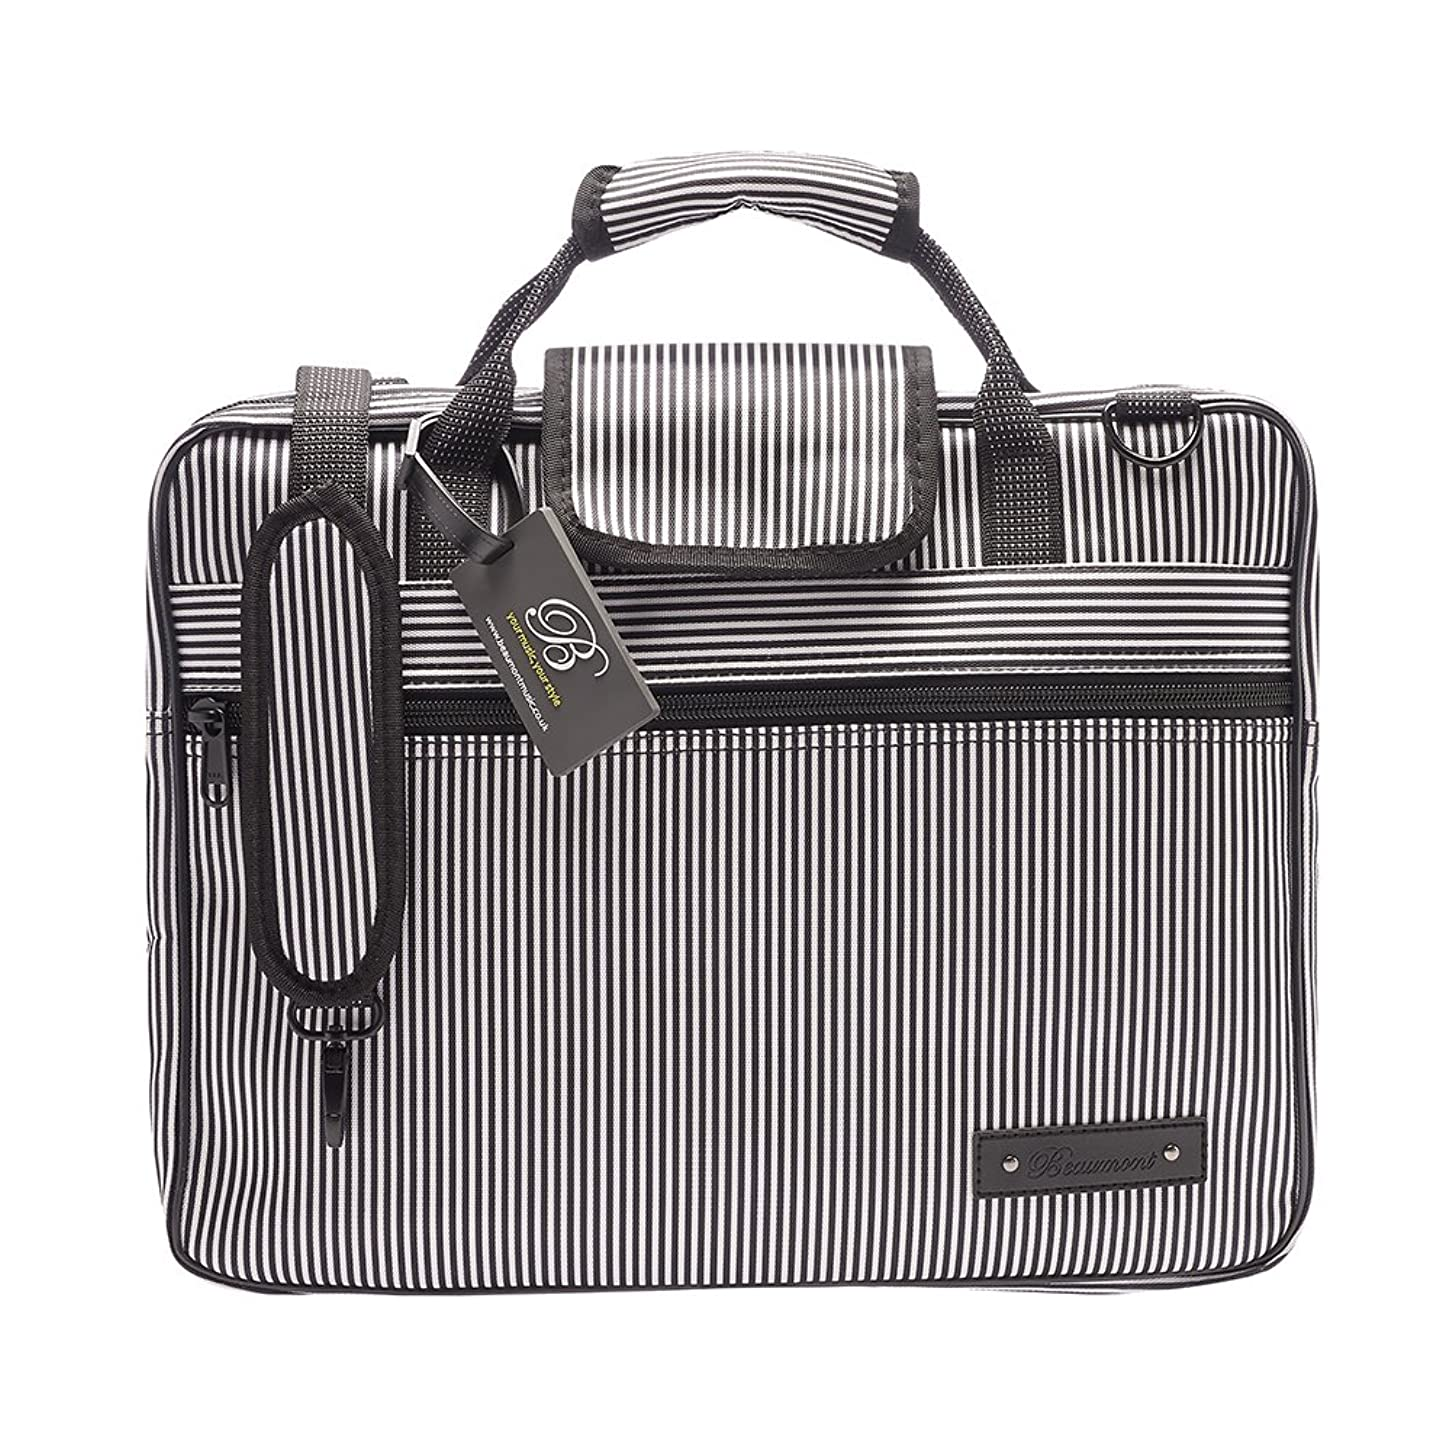 Sheet Music Bag - Satchel Design - Beaumont Pinstripe Portfolio